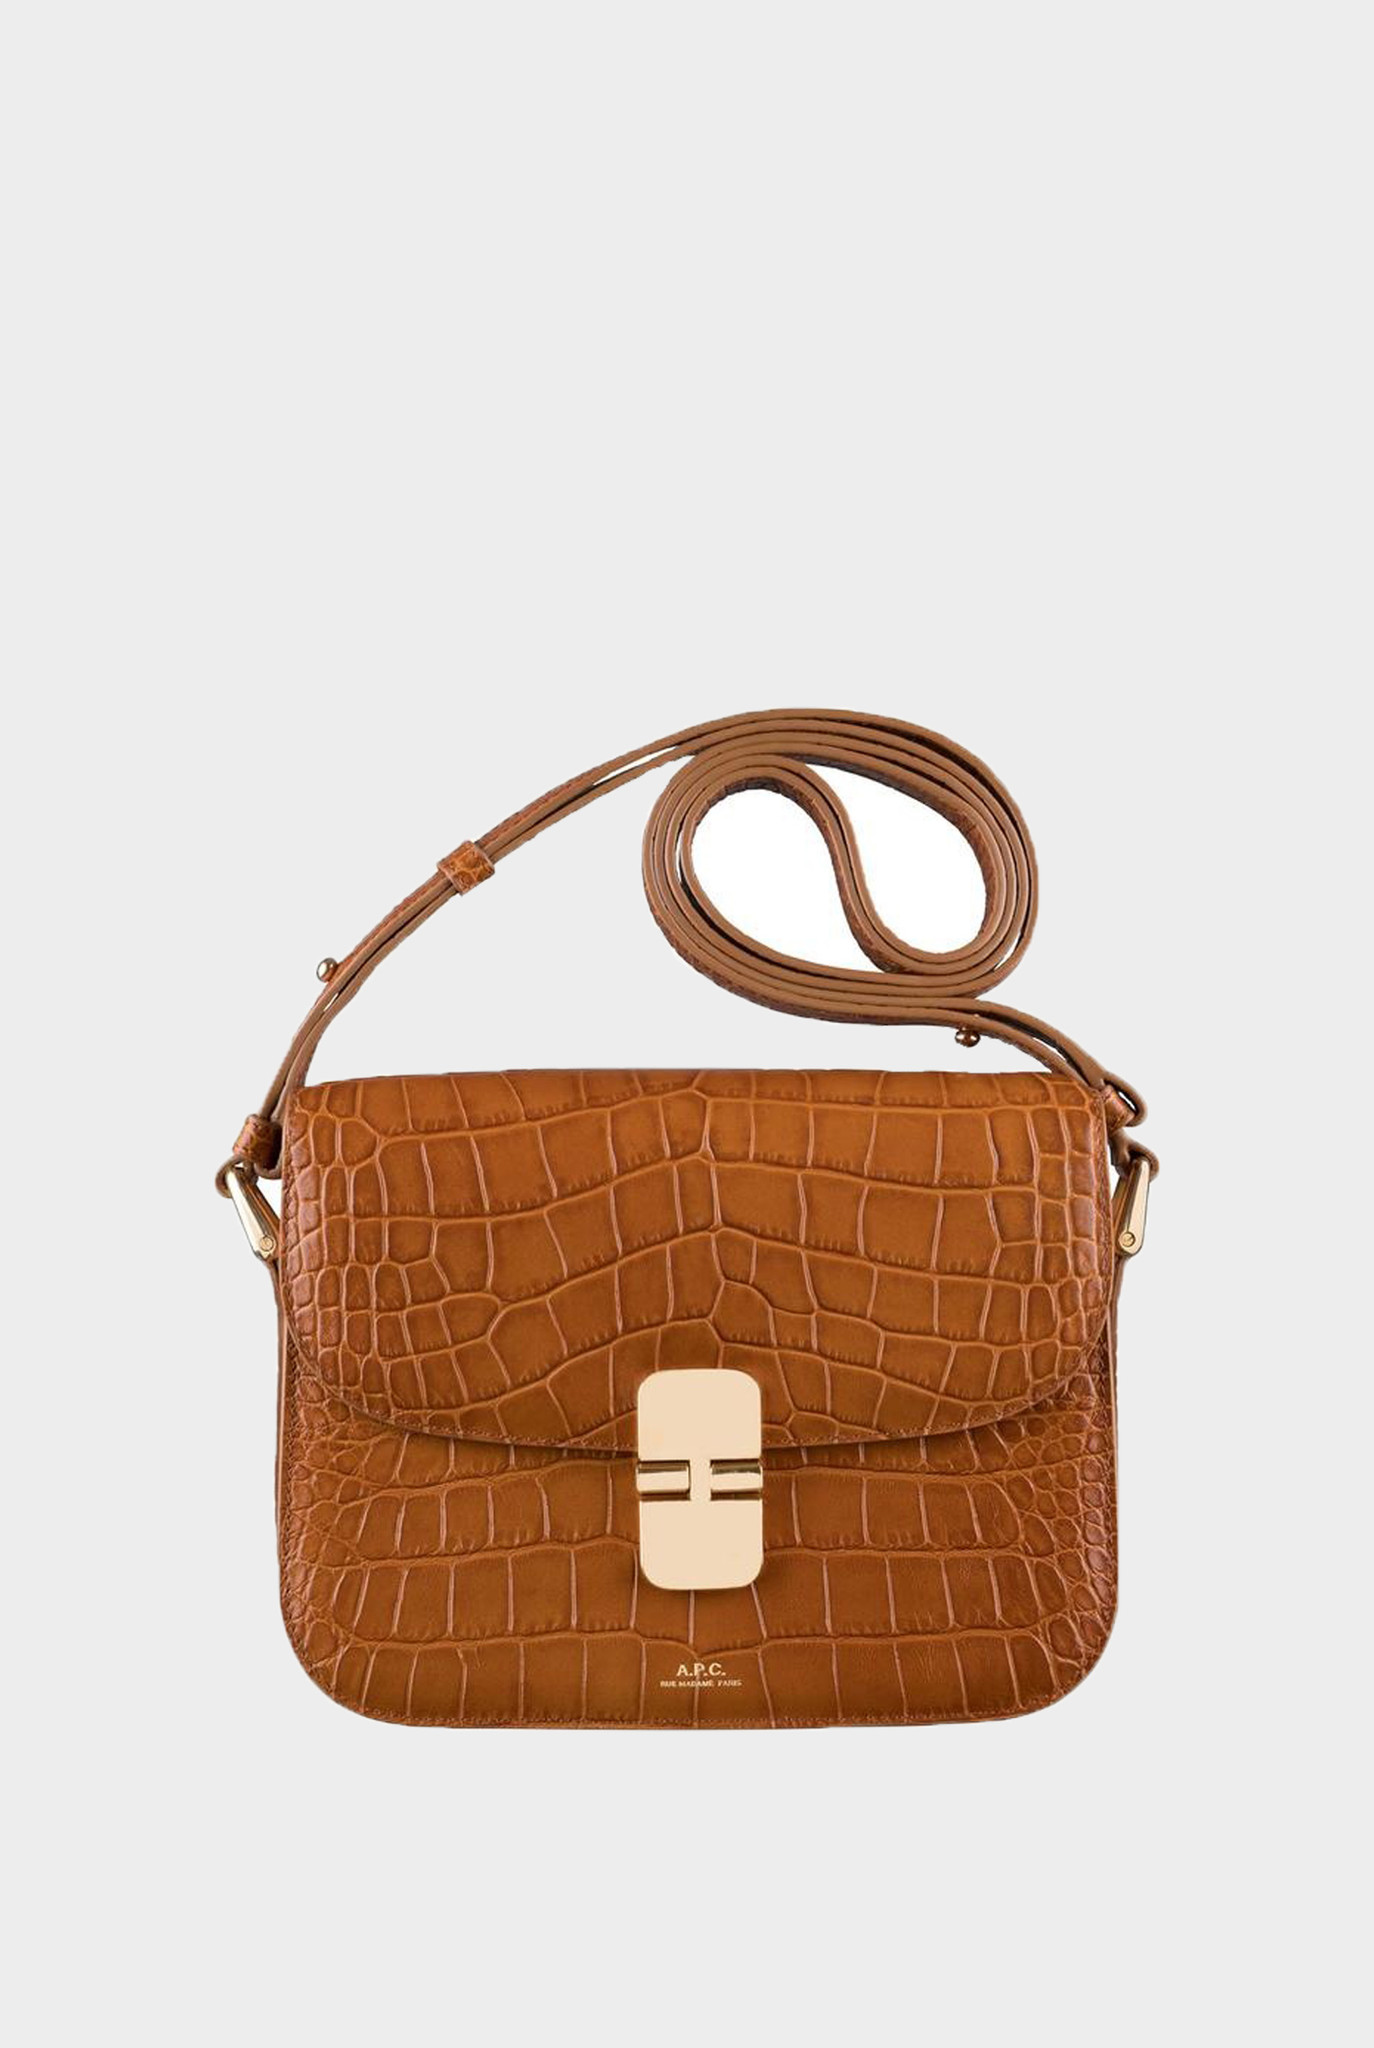 Grace Bag Small Caramel